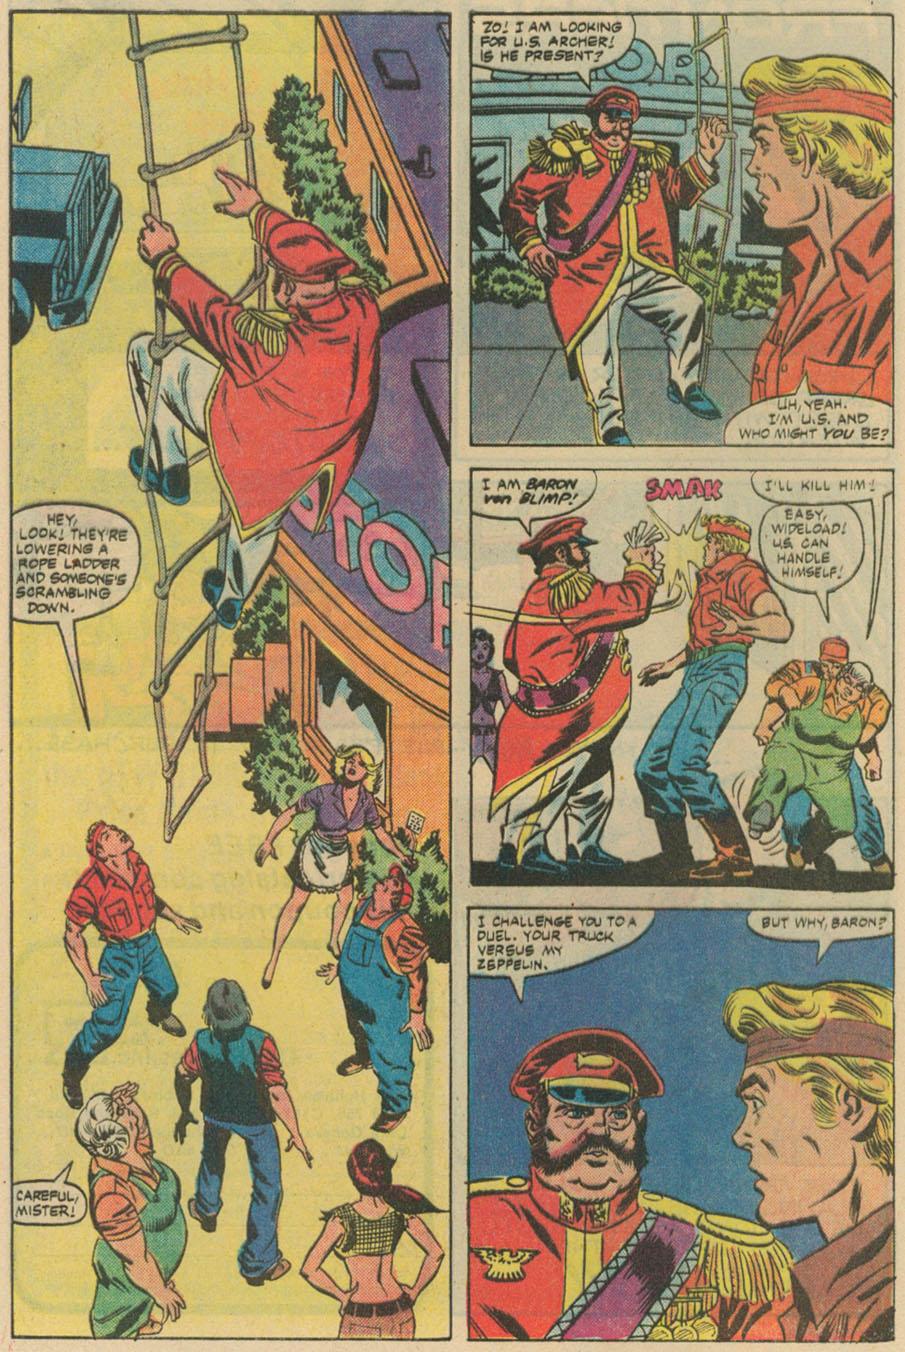 Read online U.S. 1 comic -  Issue #4 - 5